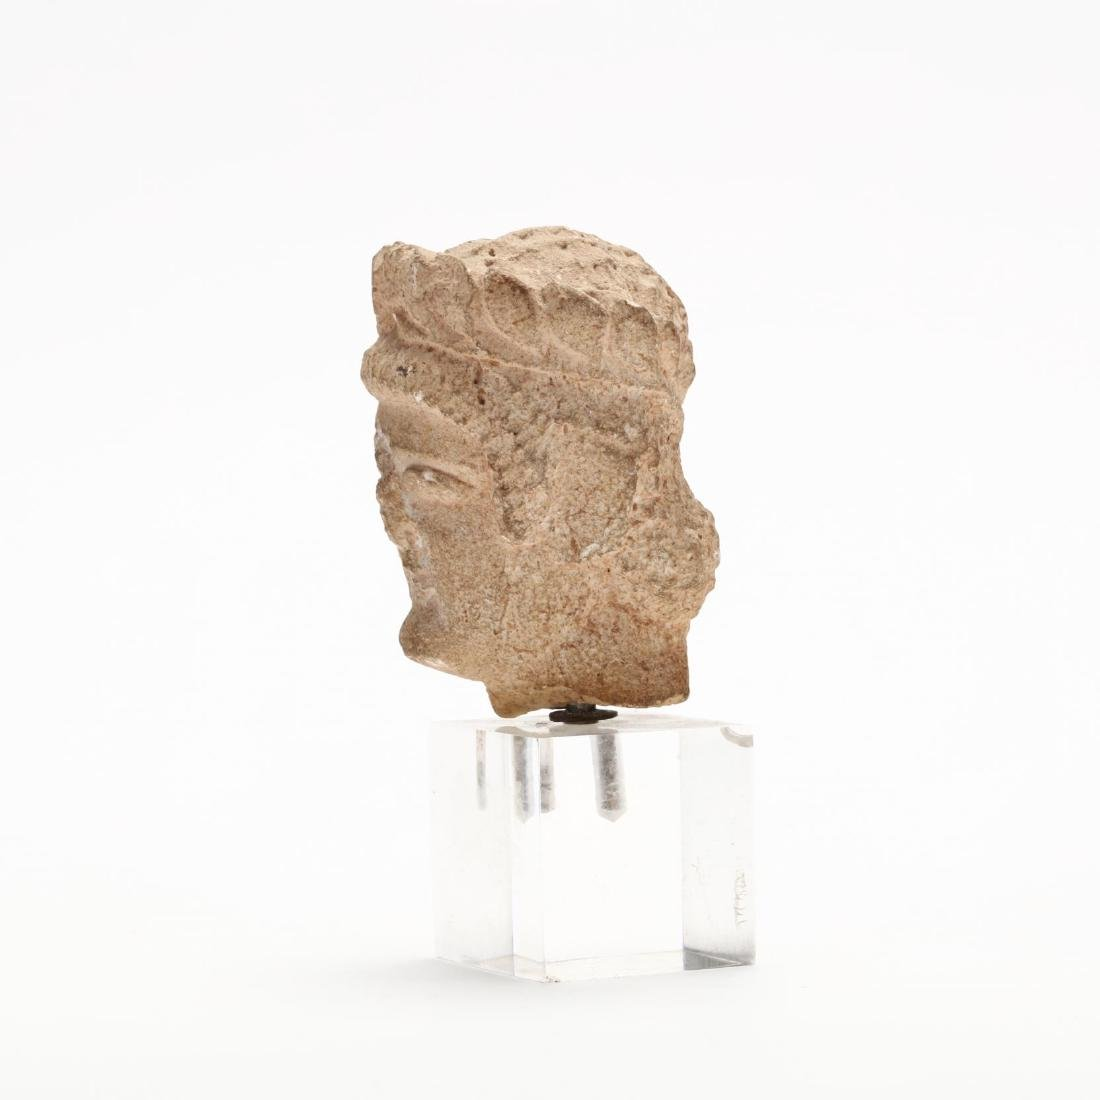 Cypriot Limestone Head of a Man - 2